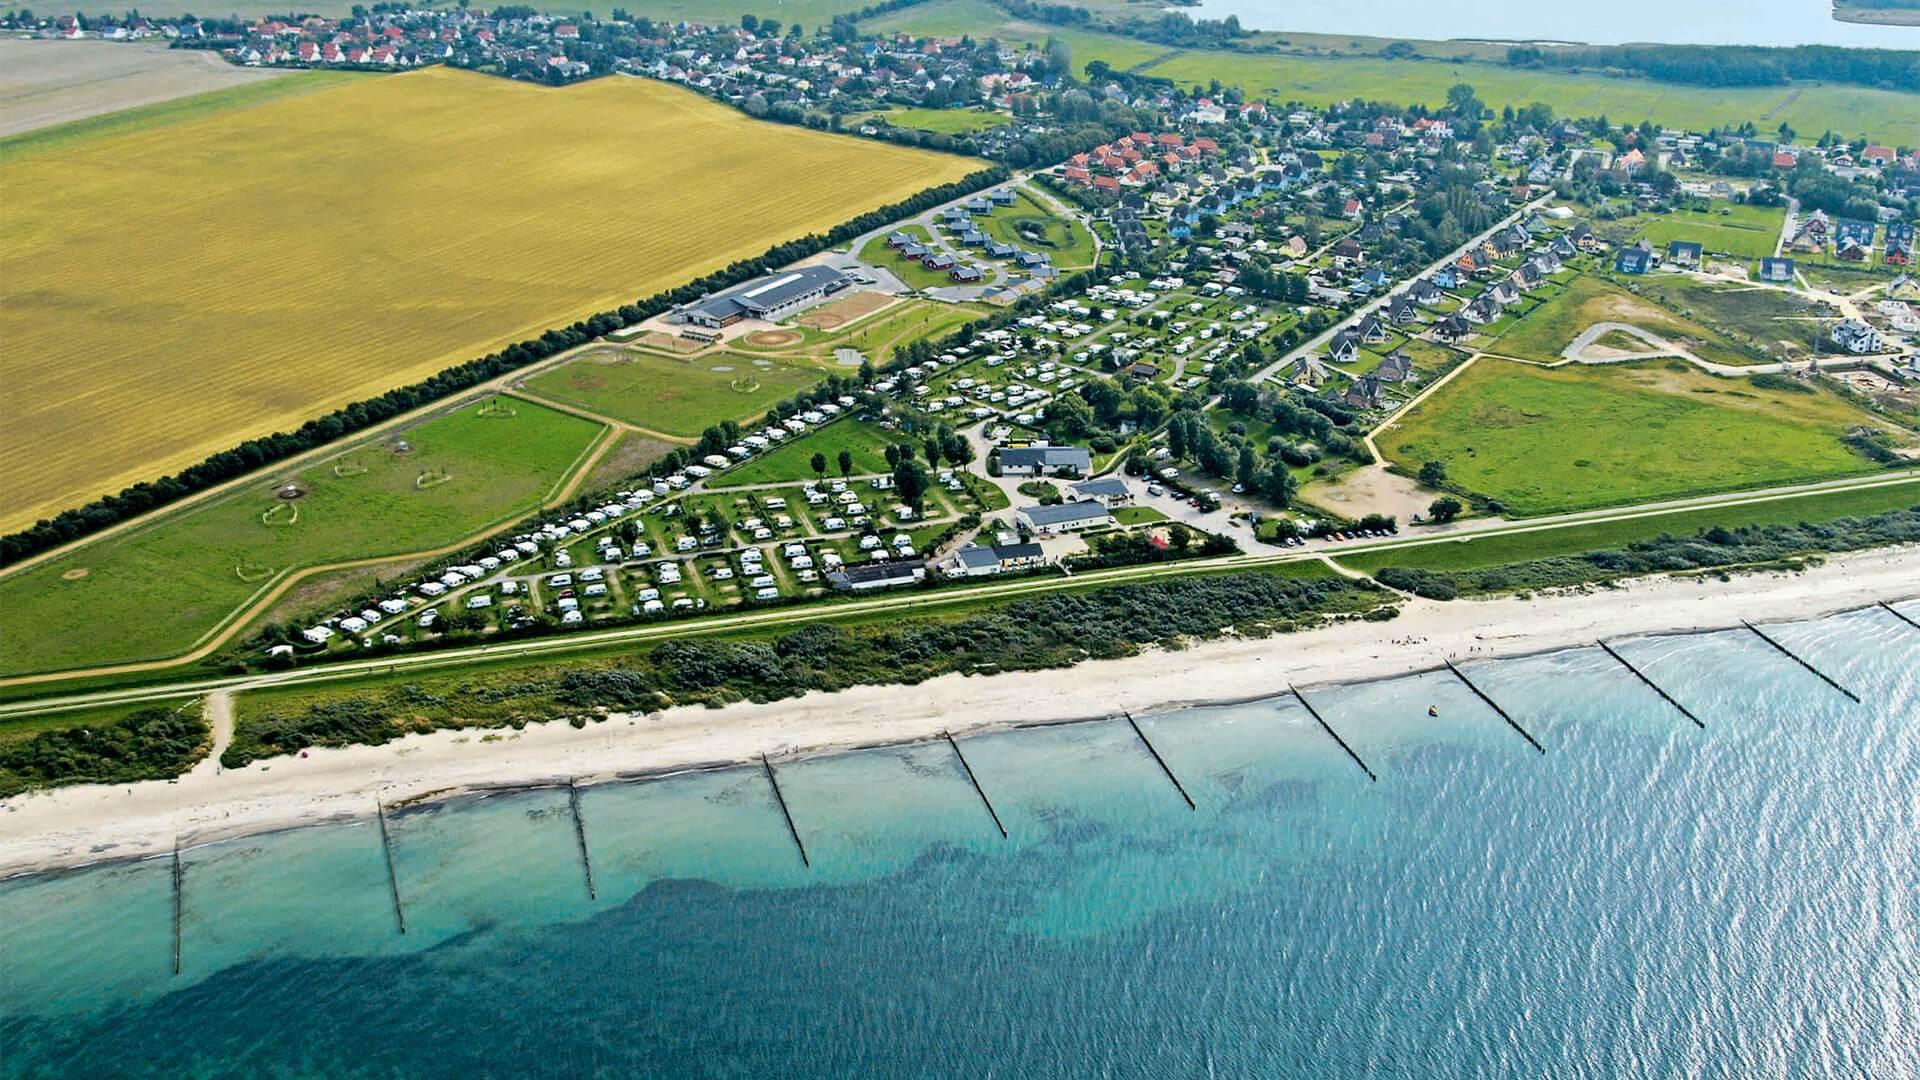 Jugend Beachvolleyball Training - Veranstaltung im Ostseebad Rerik